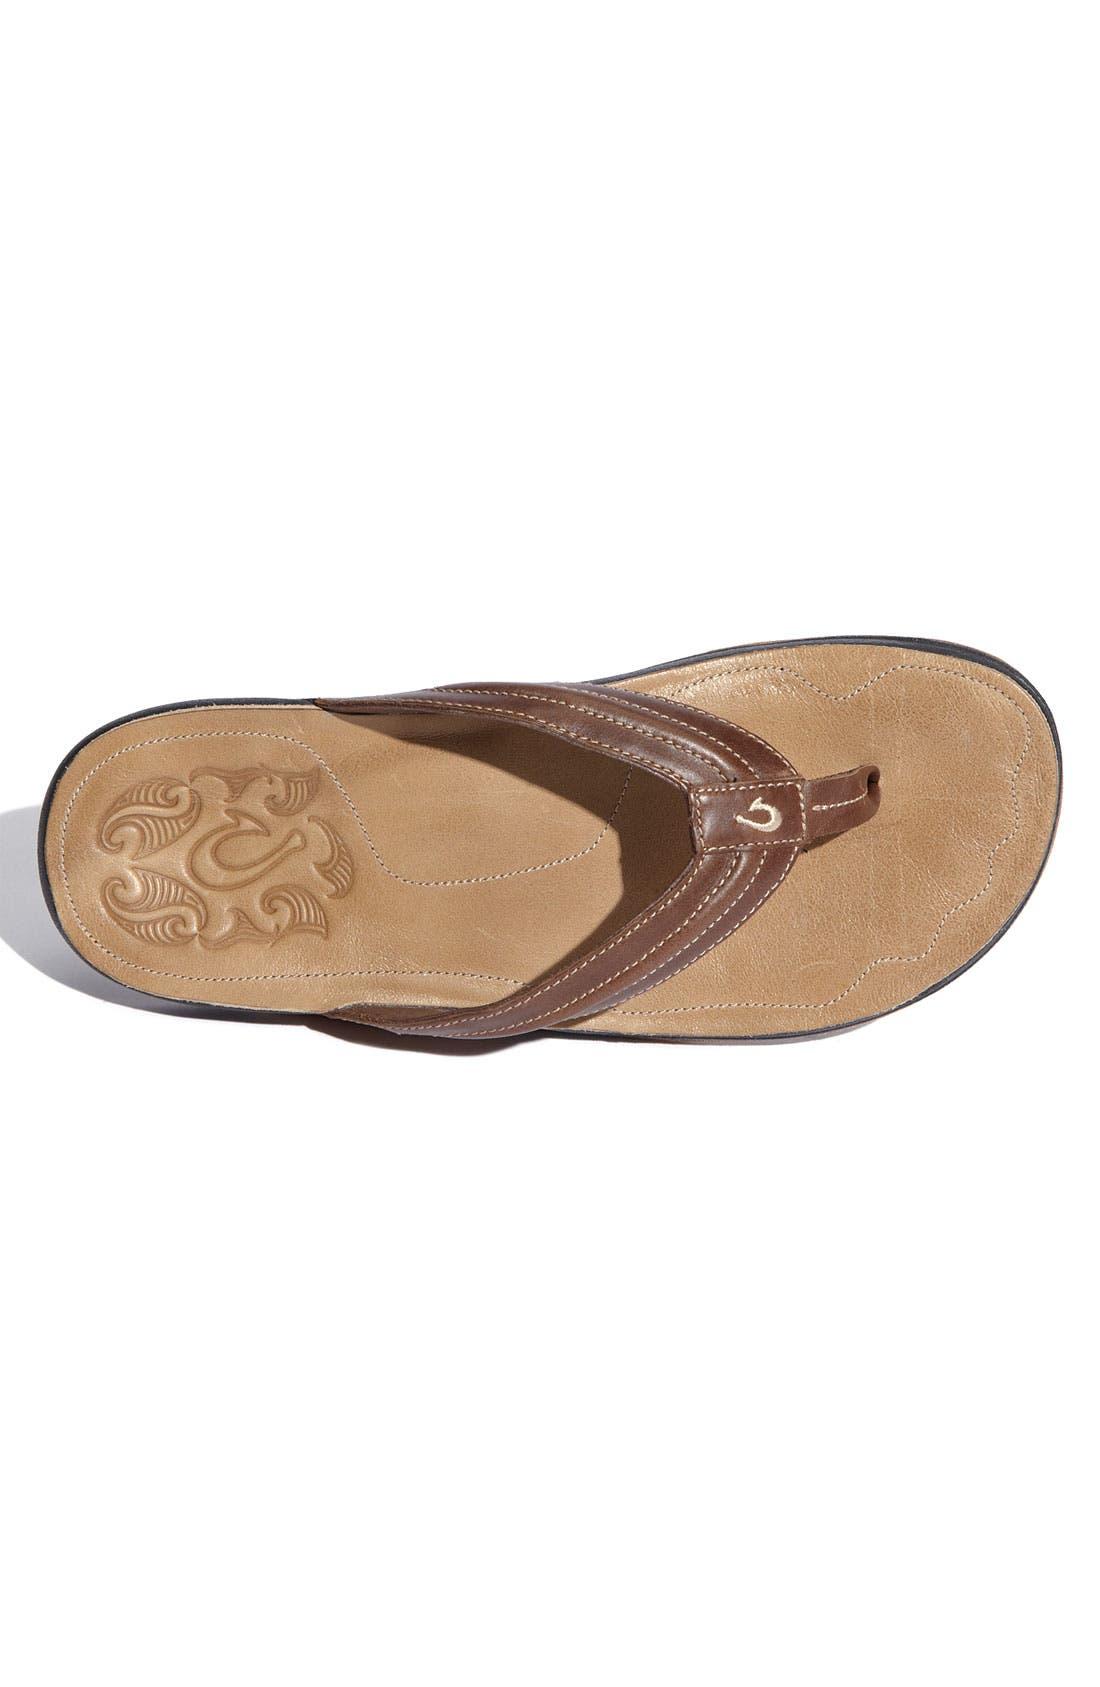 Alternate Image 3  - OluKai 'Moko' Flip Flop (Online Only)